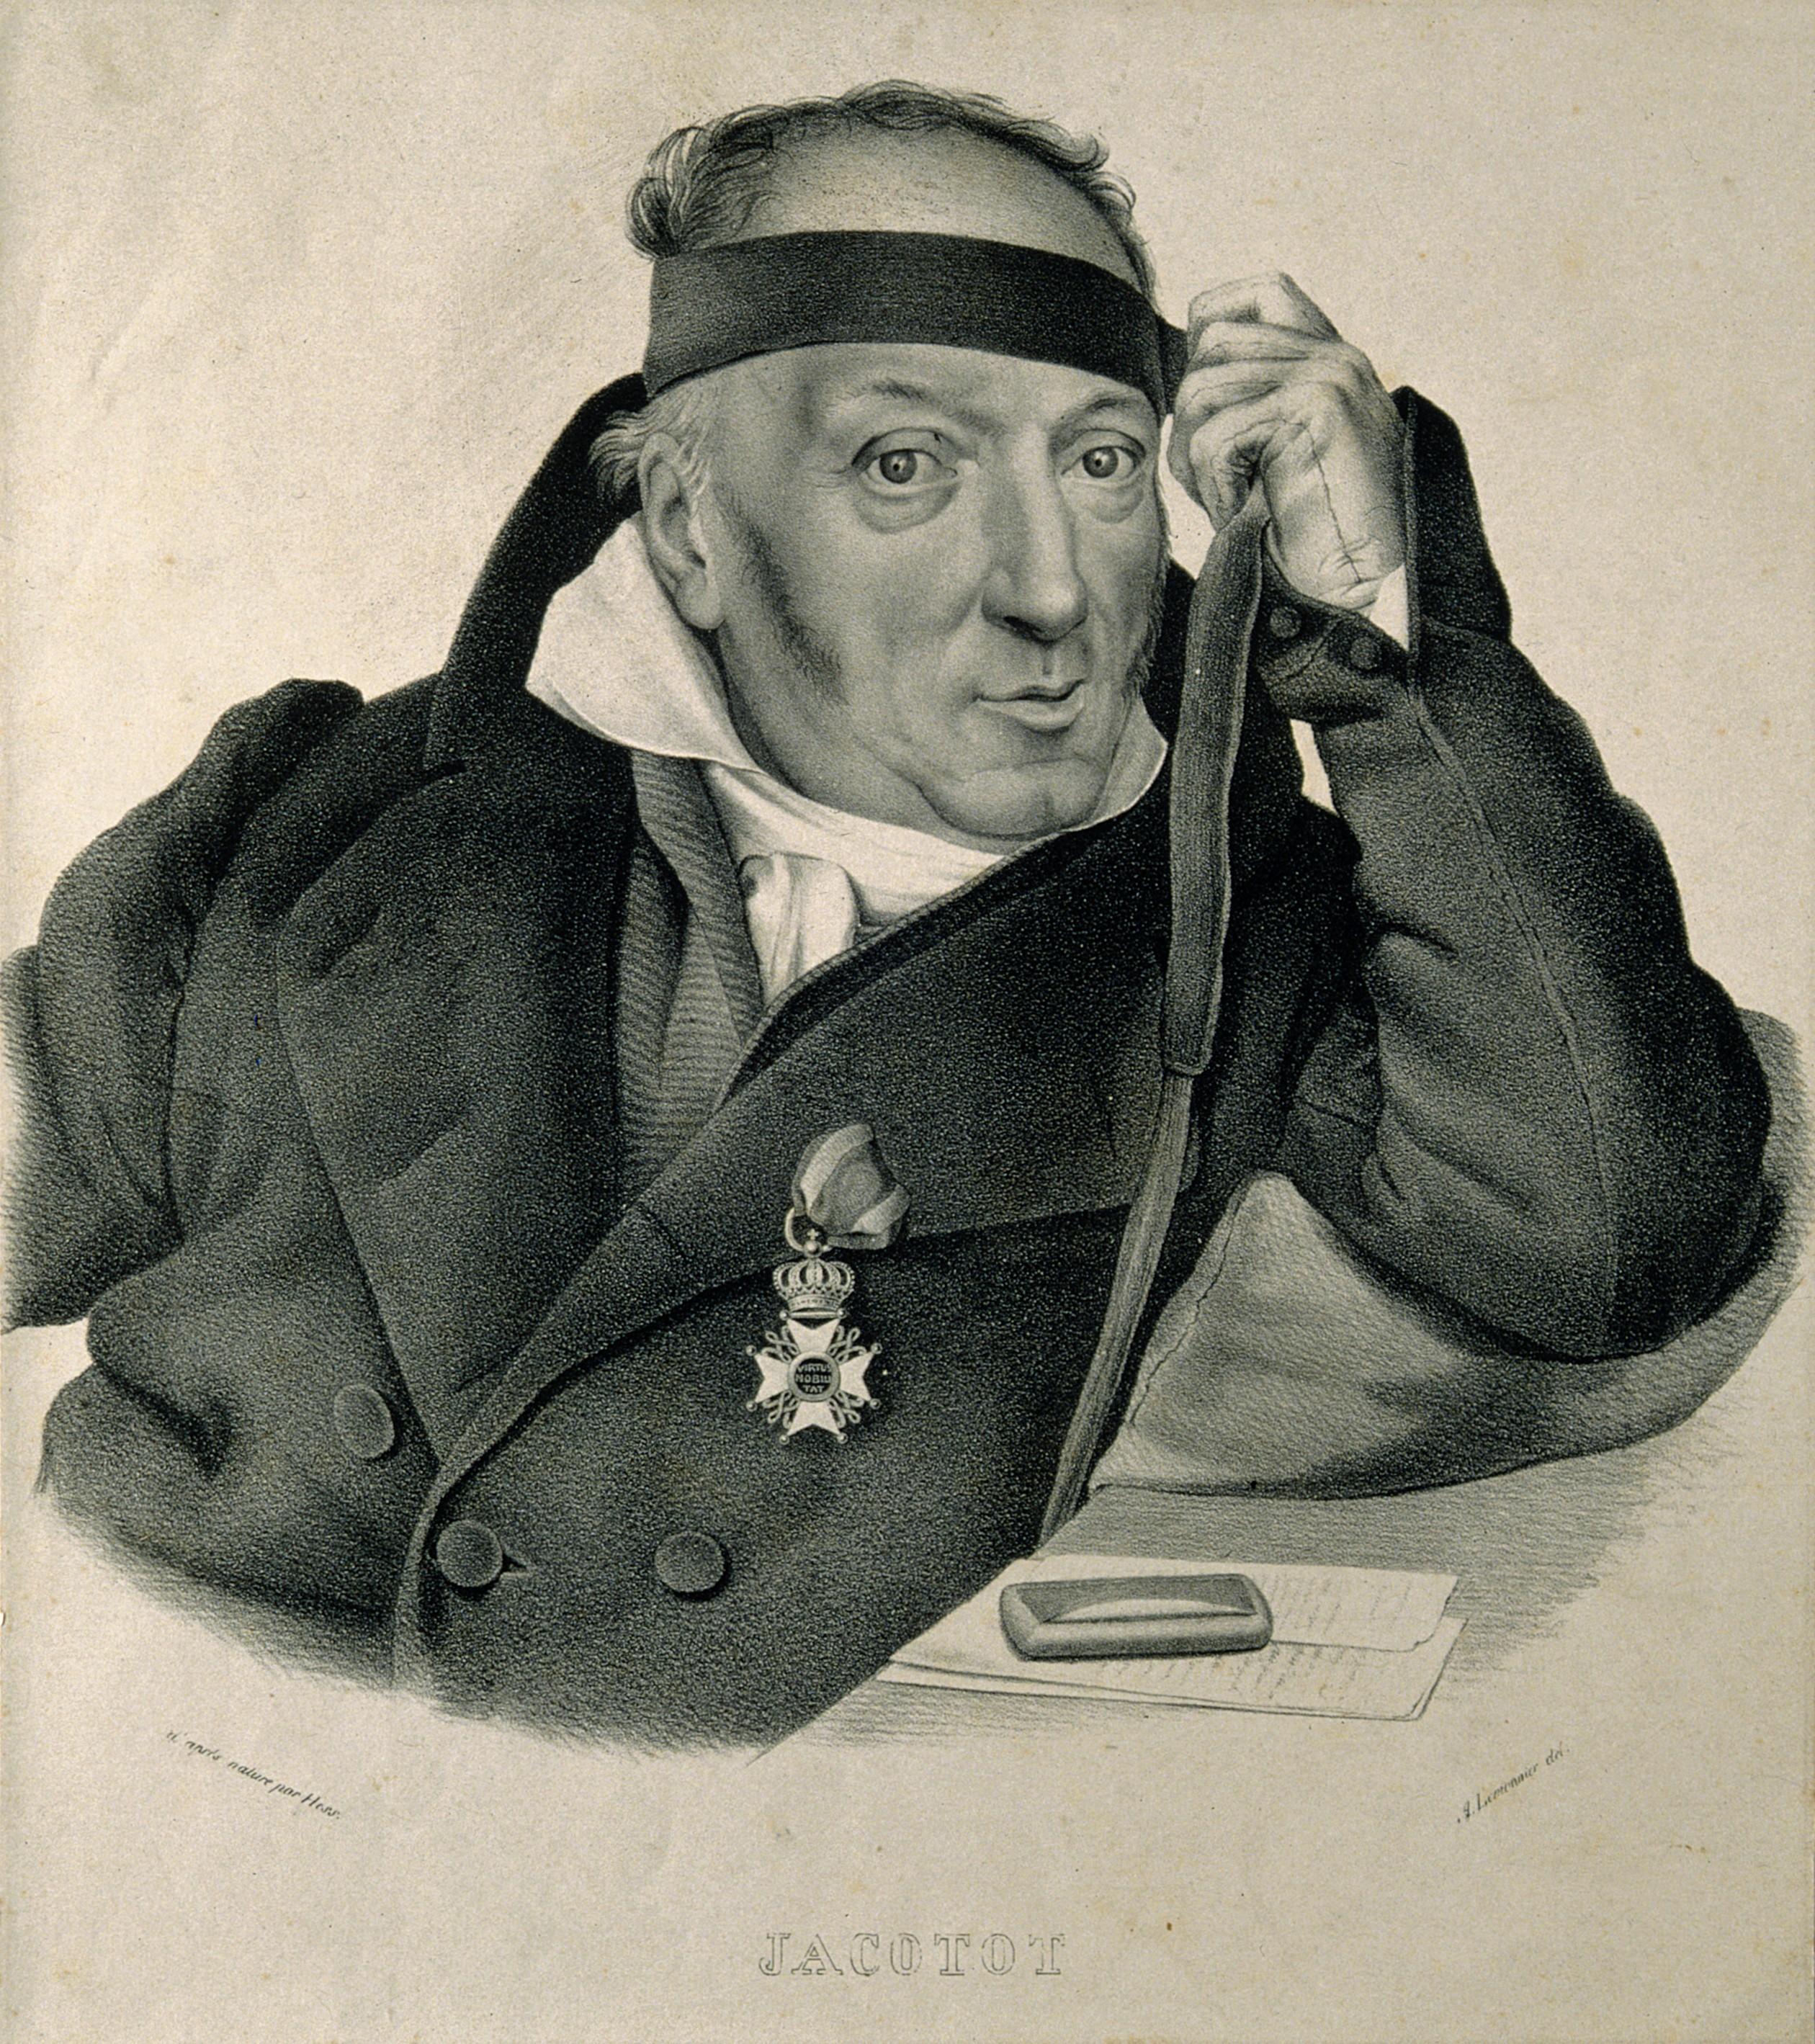 File:Joseph Jacotot. Lithograph by A. Lemonnier after Hess. Wellcome  V0003035.jpg - Wikimedia Commons